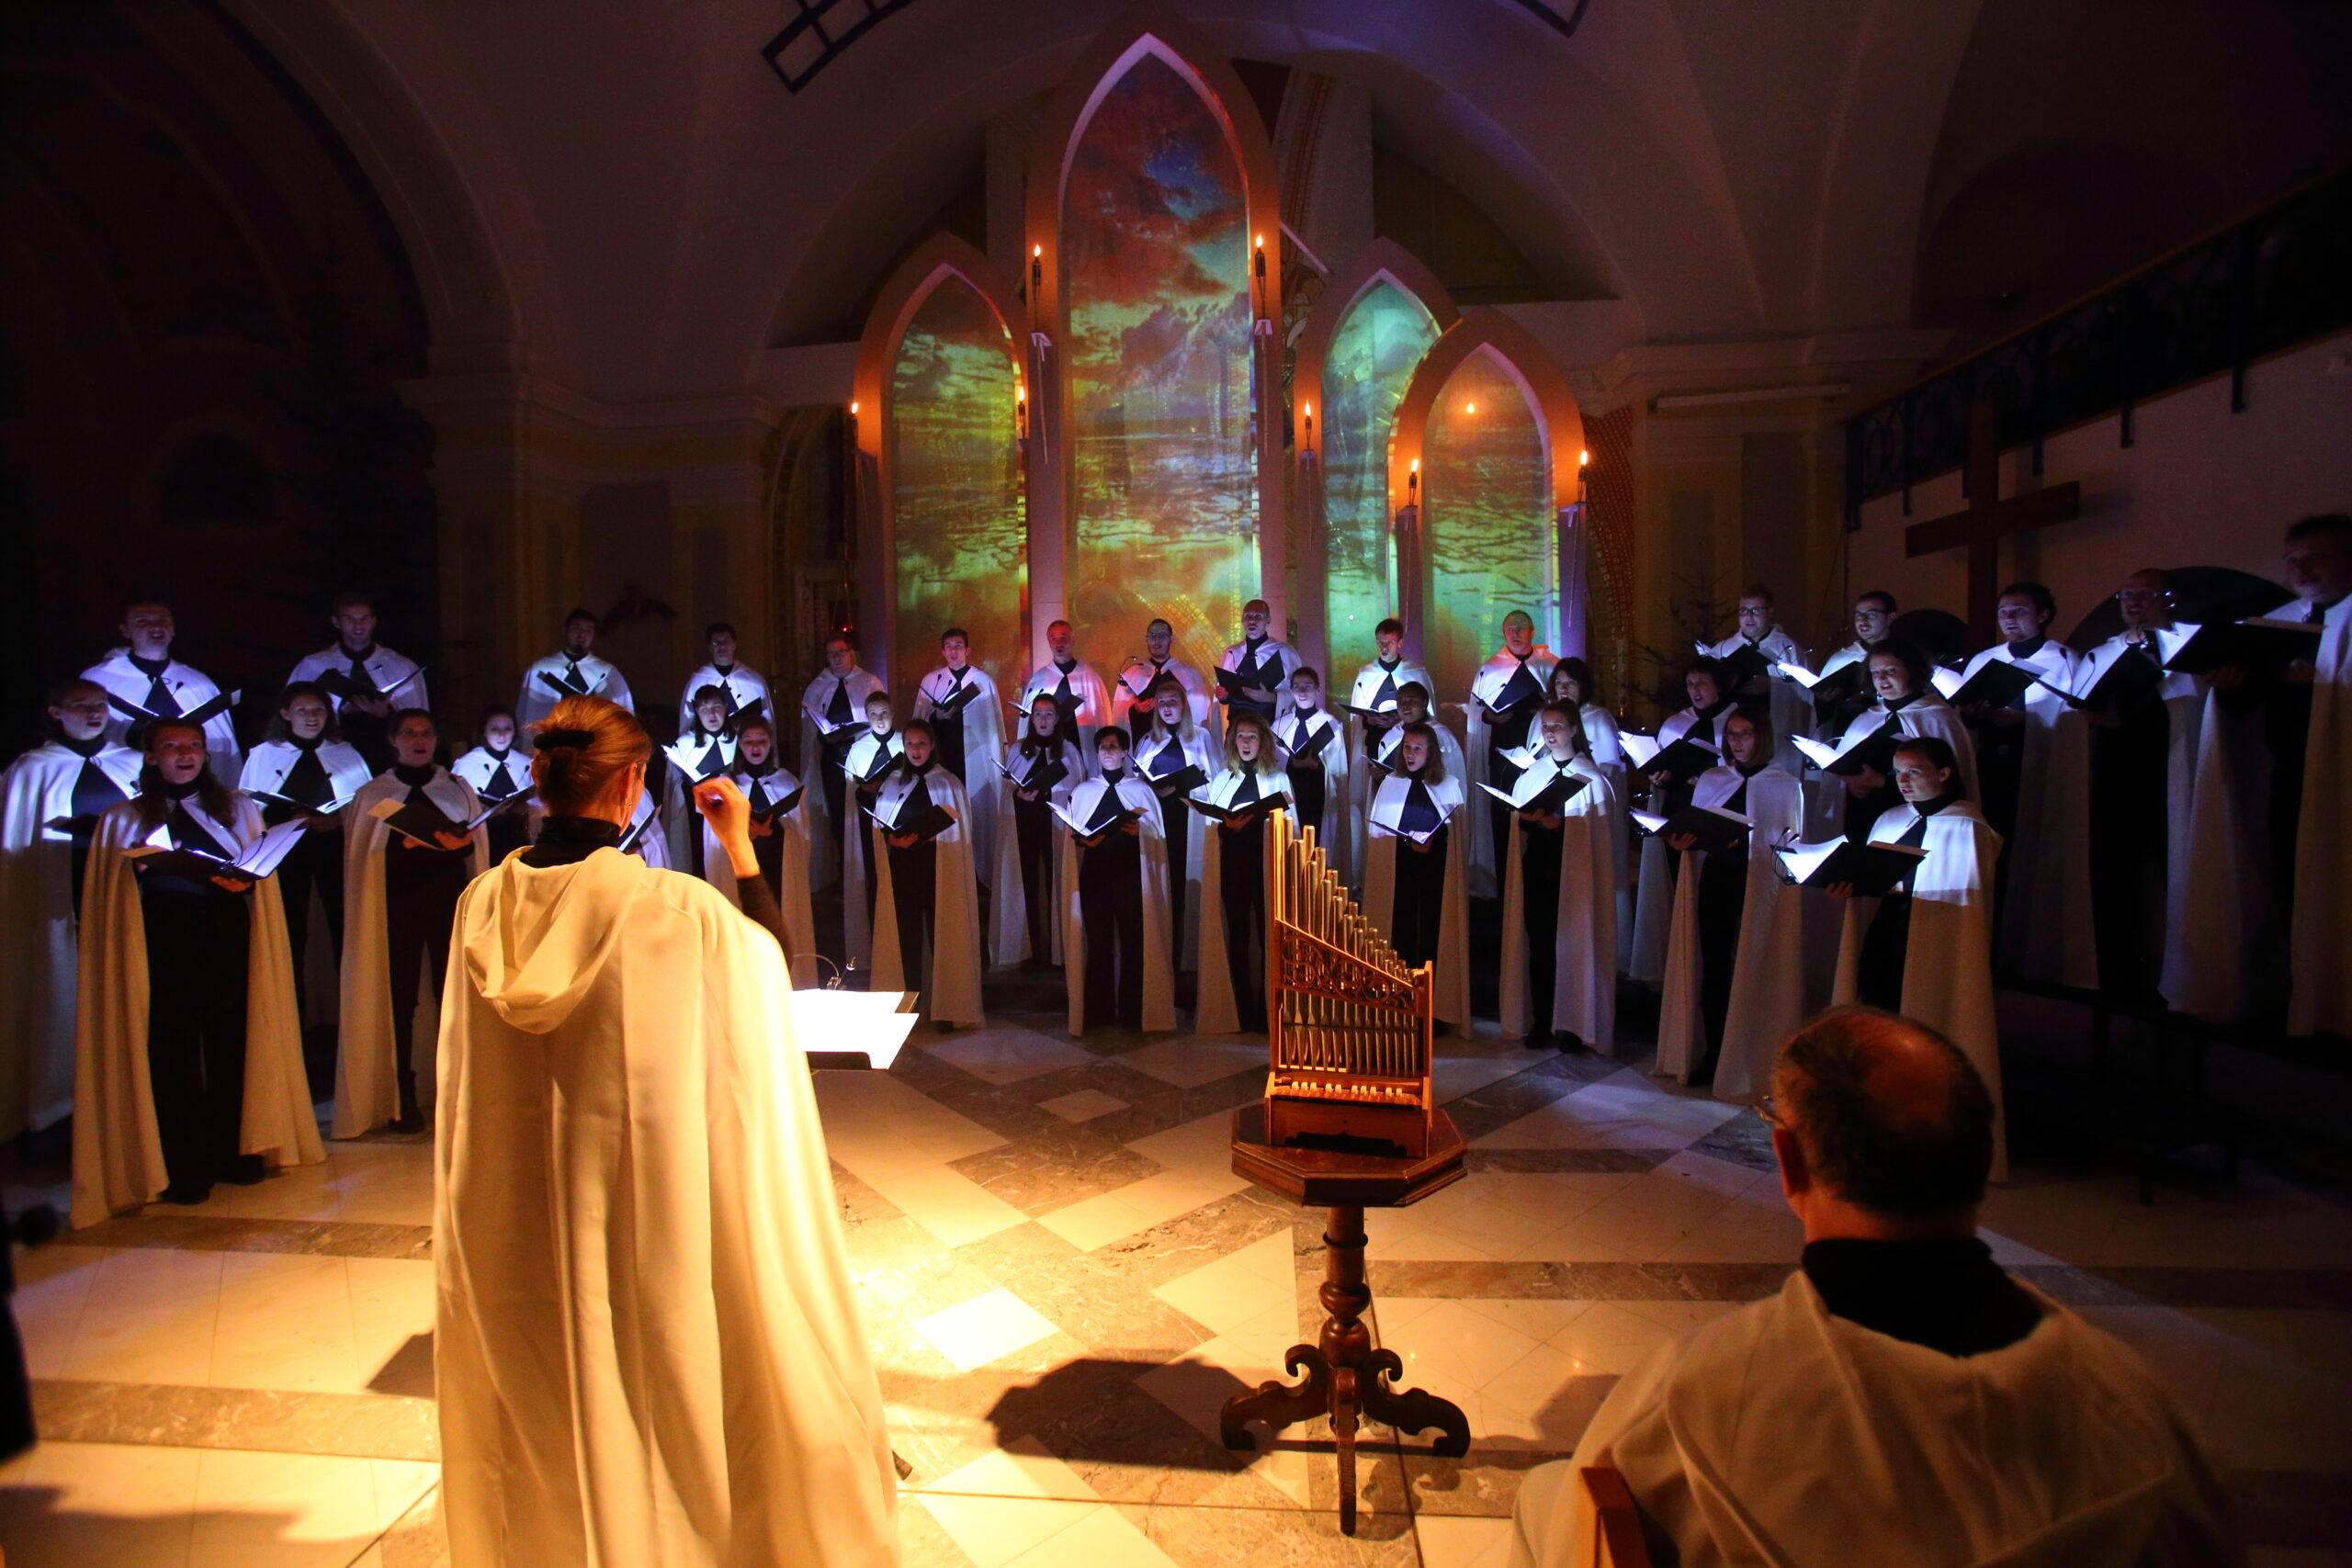 Gregor Požun, Slovenija/Slovenia: Oremus! Molimo! 2015, Zbor sv. Nikolaja Litija, Slovenija / Oremus! Let us pray!, 2015, The saint Nicholas Choir Litija, Slovenia